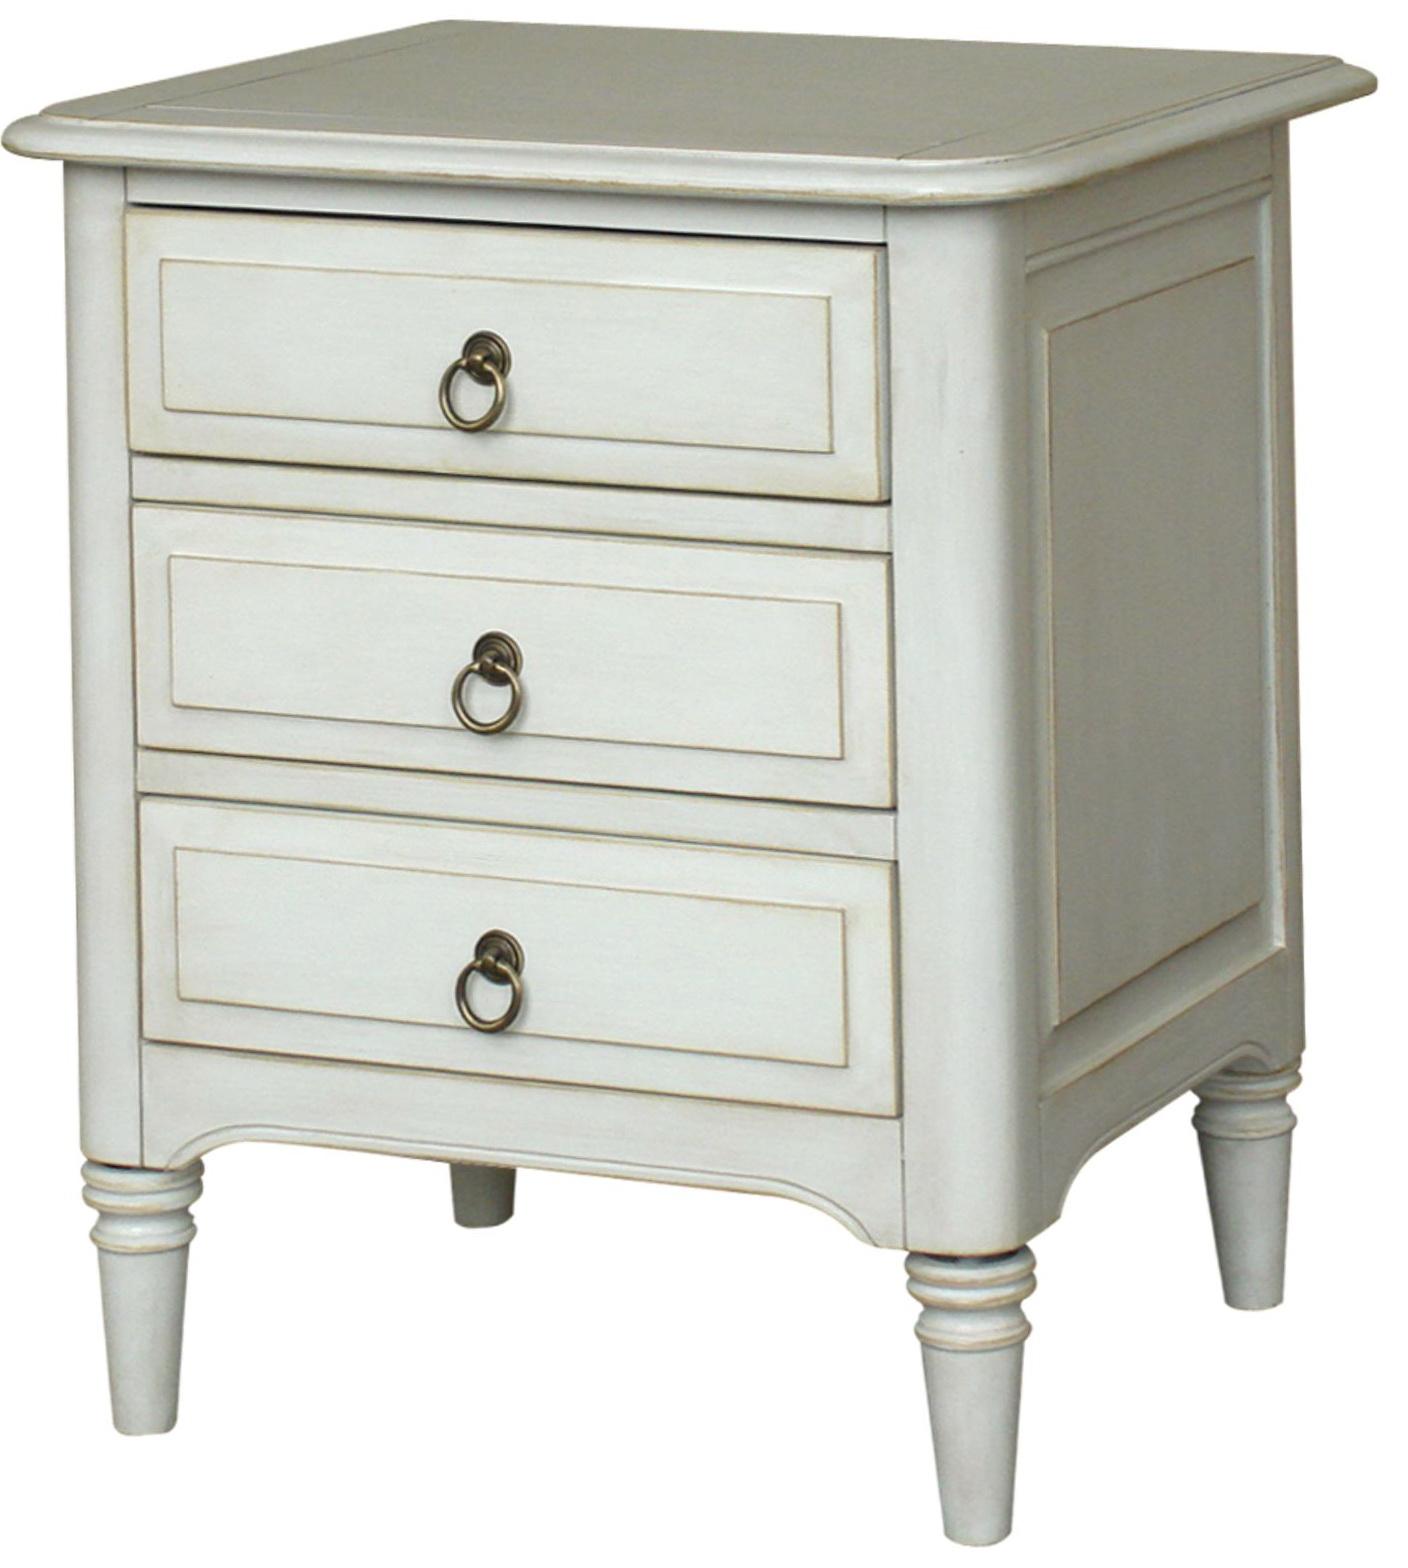 Off White Dresser Furniture